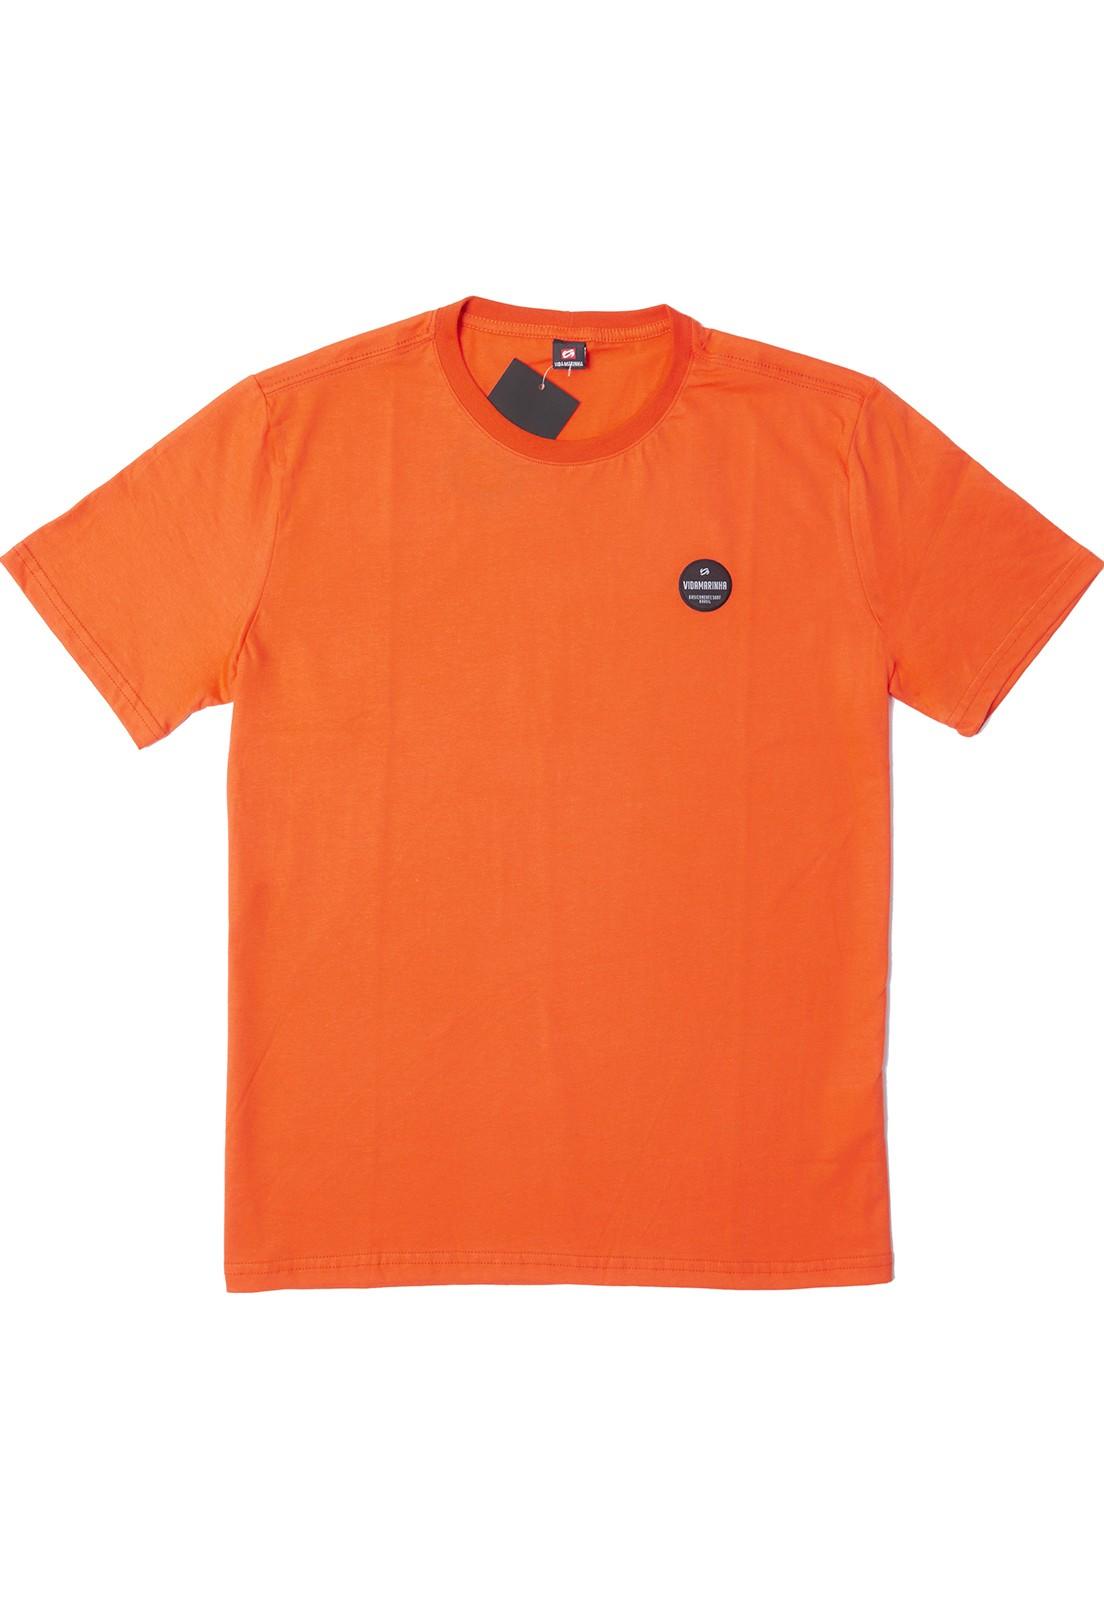 Camiseta Vida Marinha Manga Curta Básica Laranja